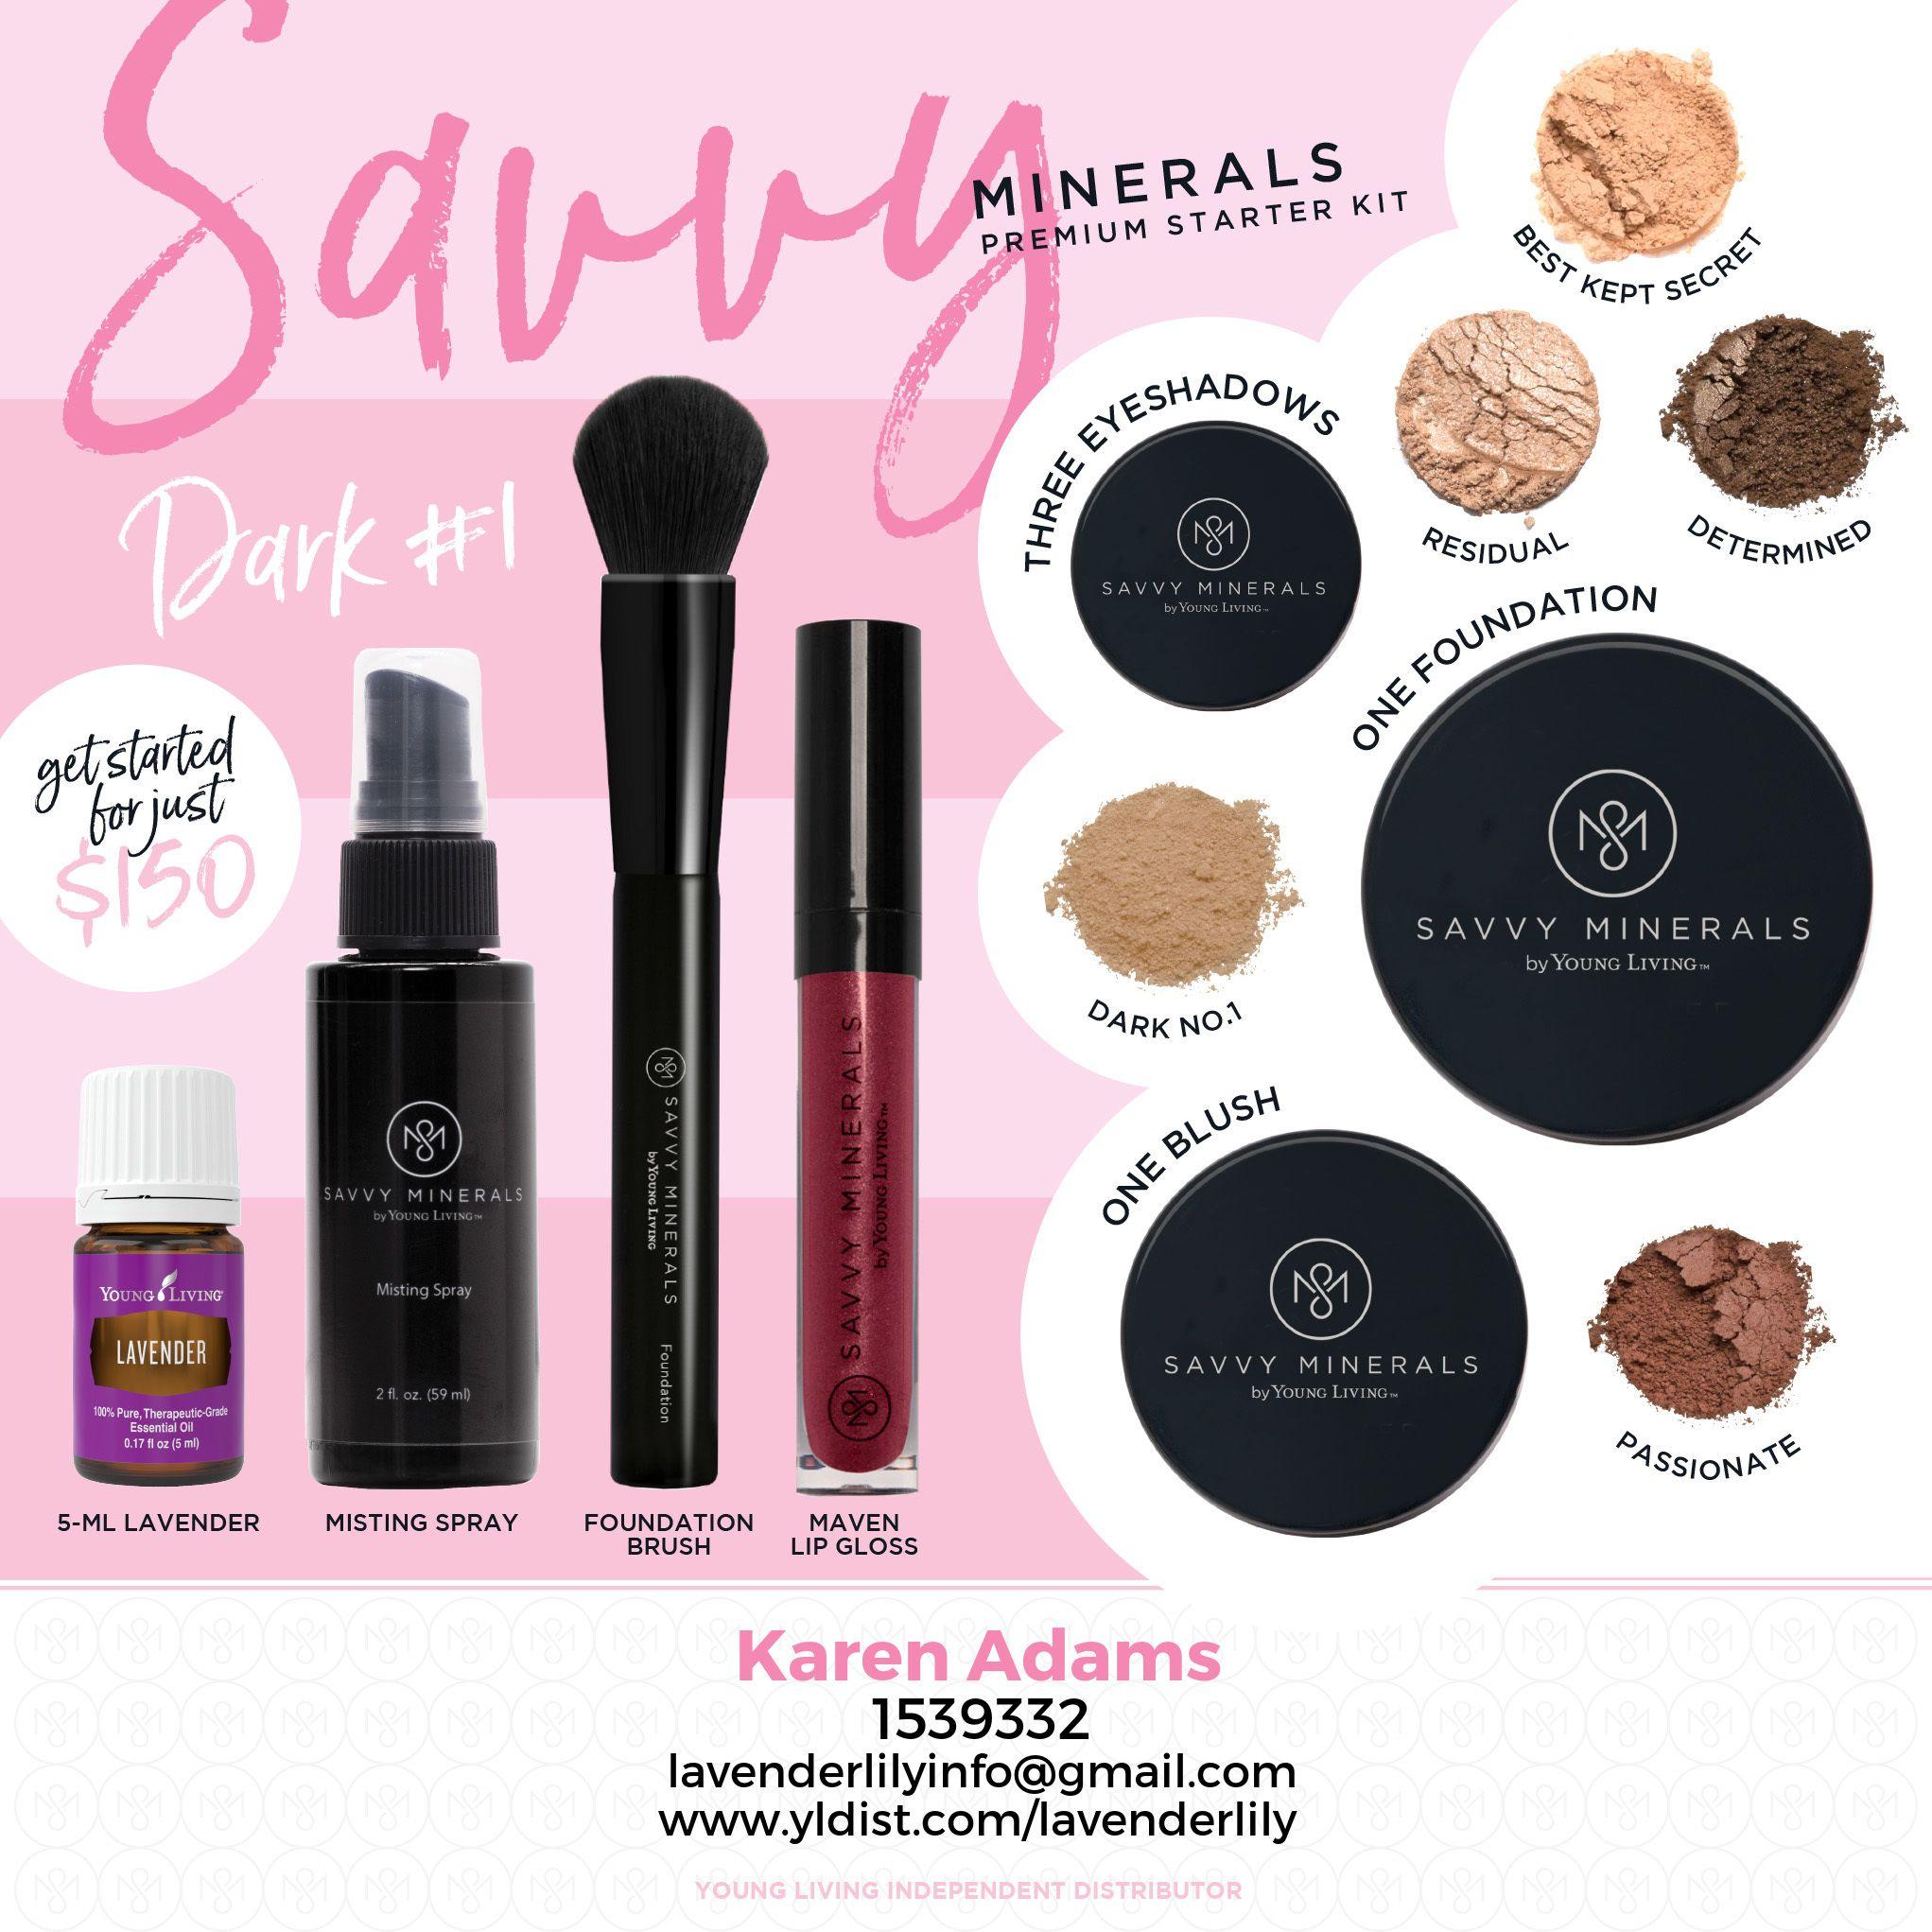 YLEO Savvy Minerals Premium Starter Kit for Dark 1 Skin